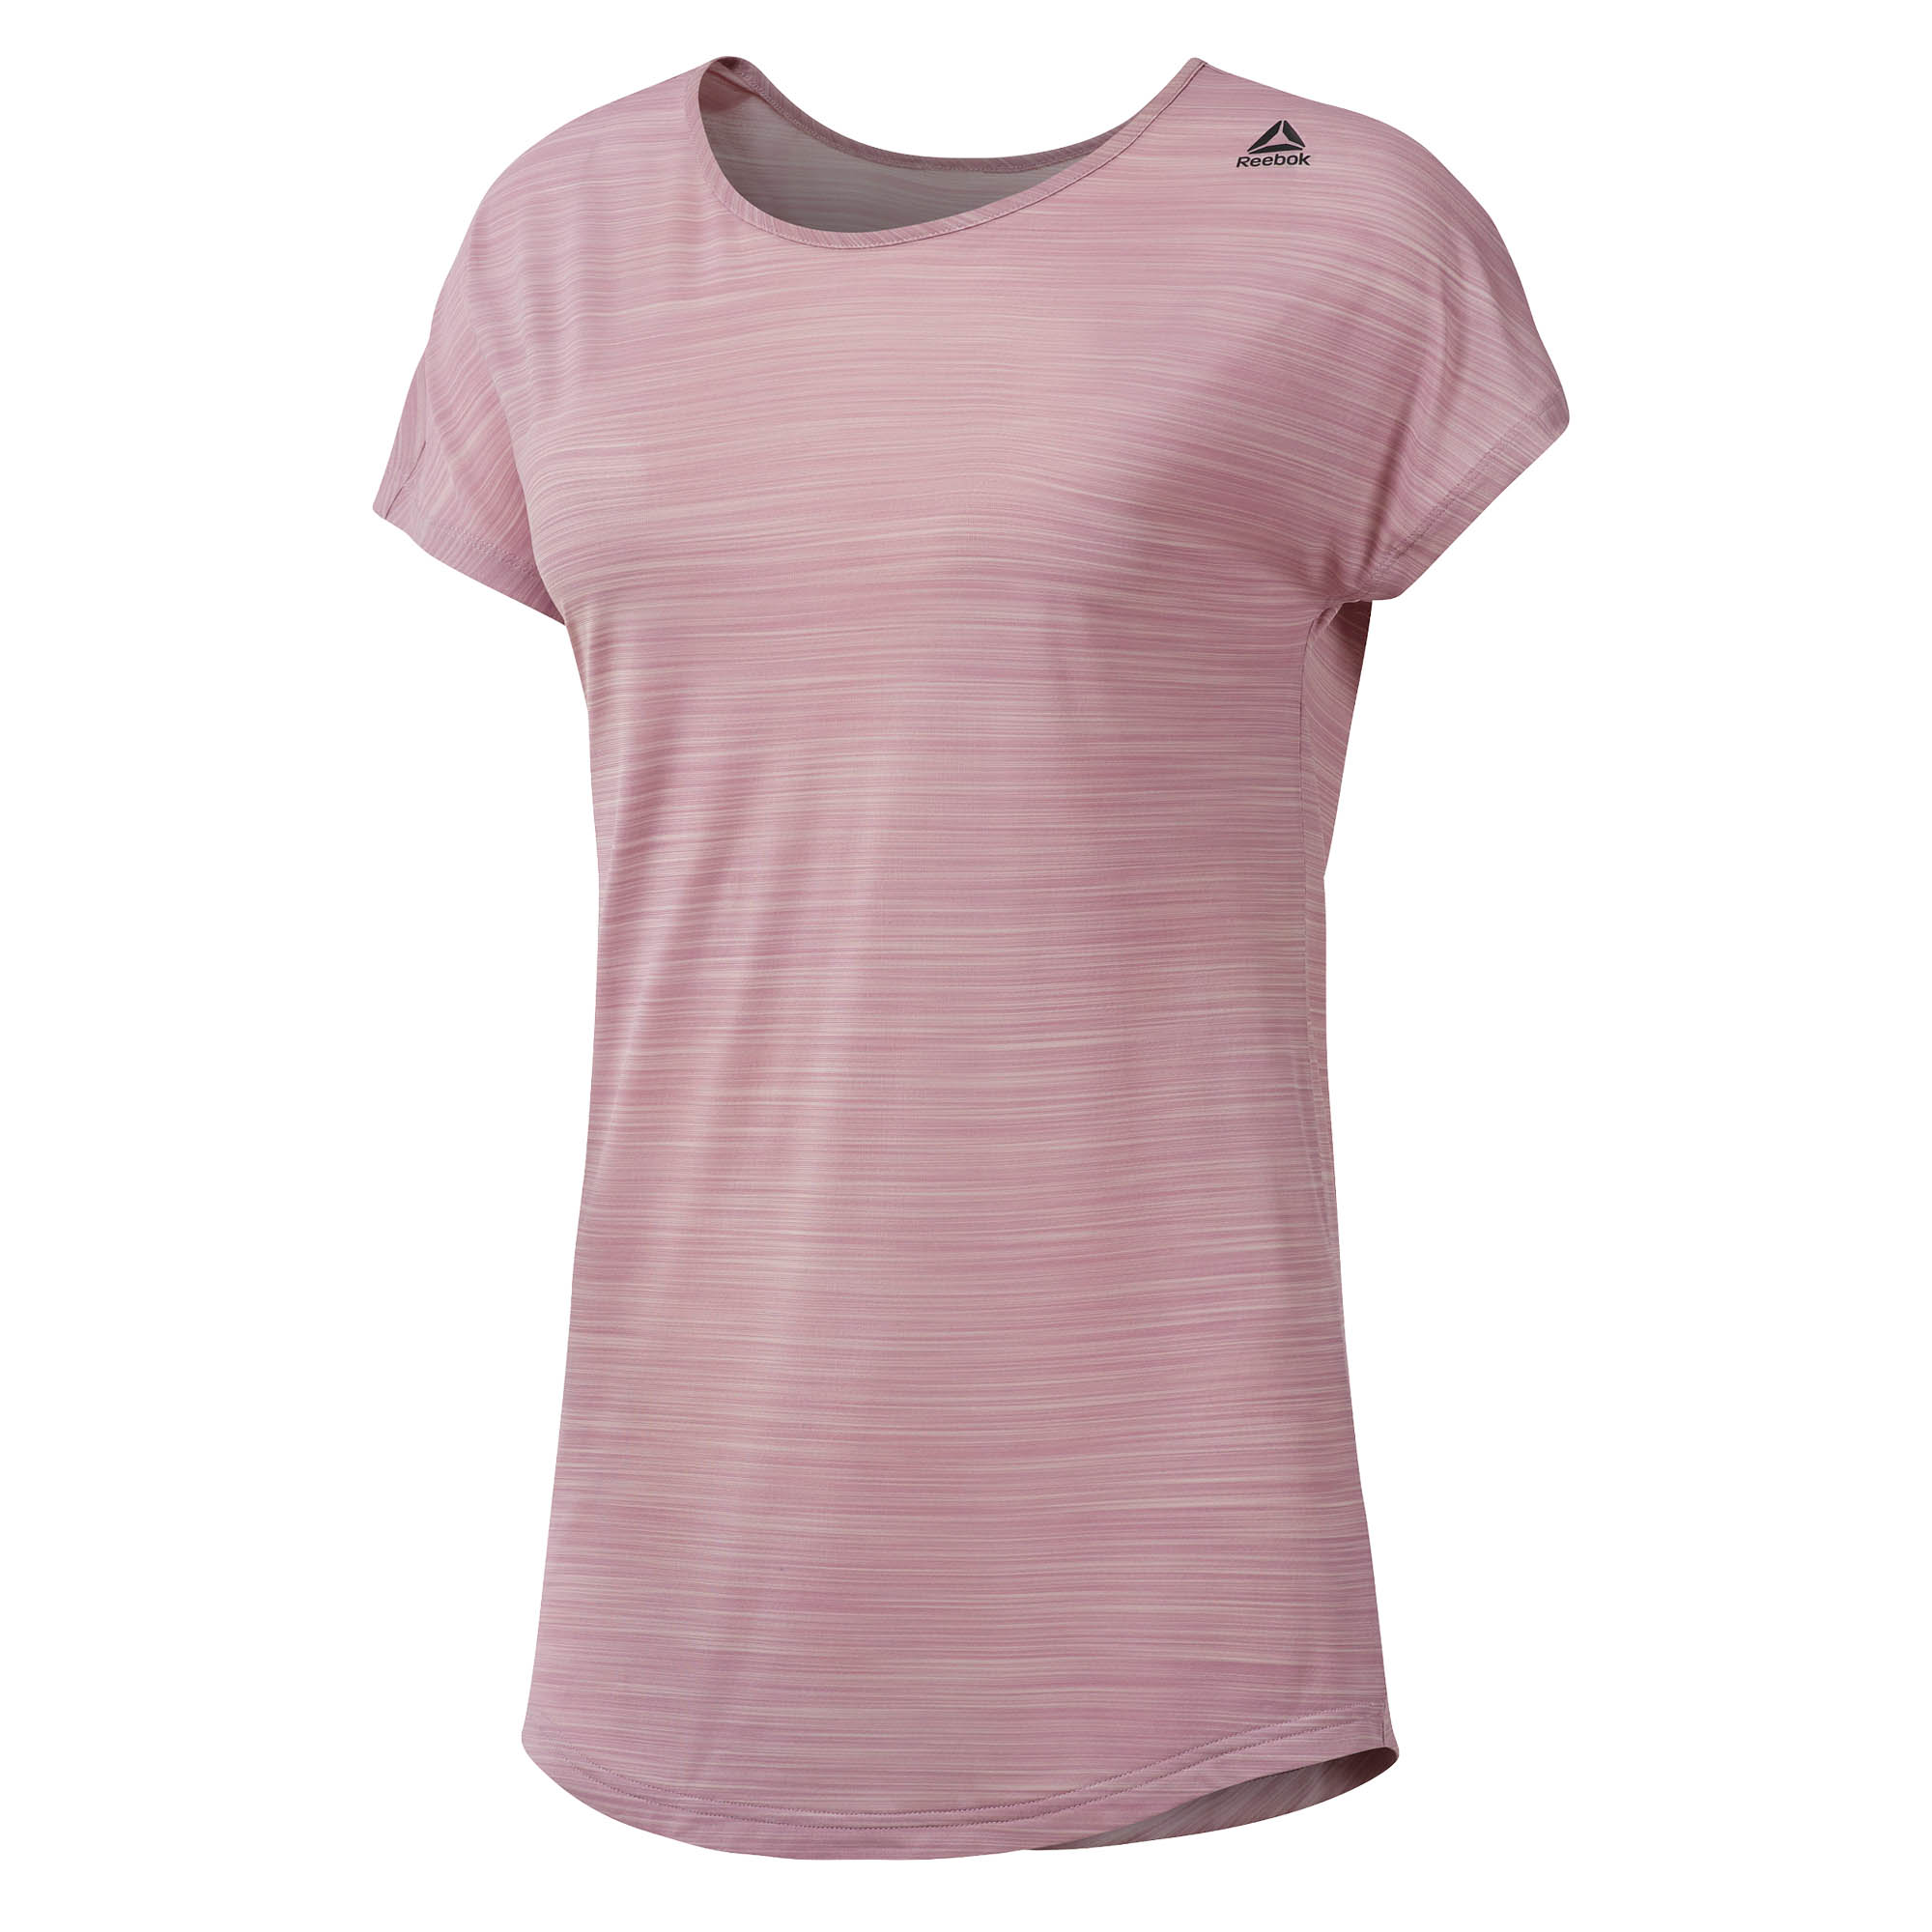 a5a9643405be5f Entrenamiento de Reebok listo ACTIVChill mujeres damas Fitness Camiseta Tee  rosa